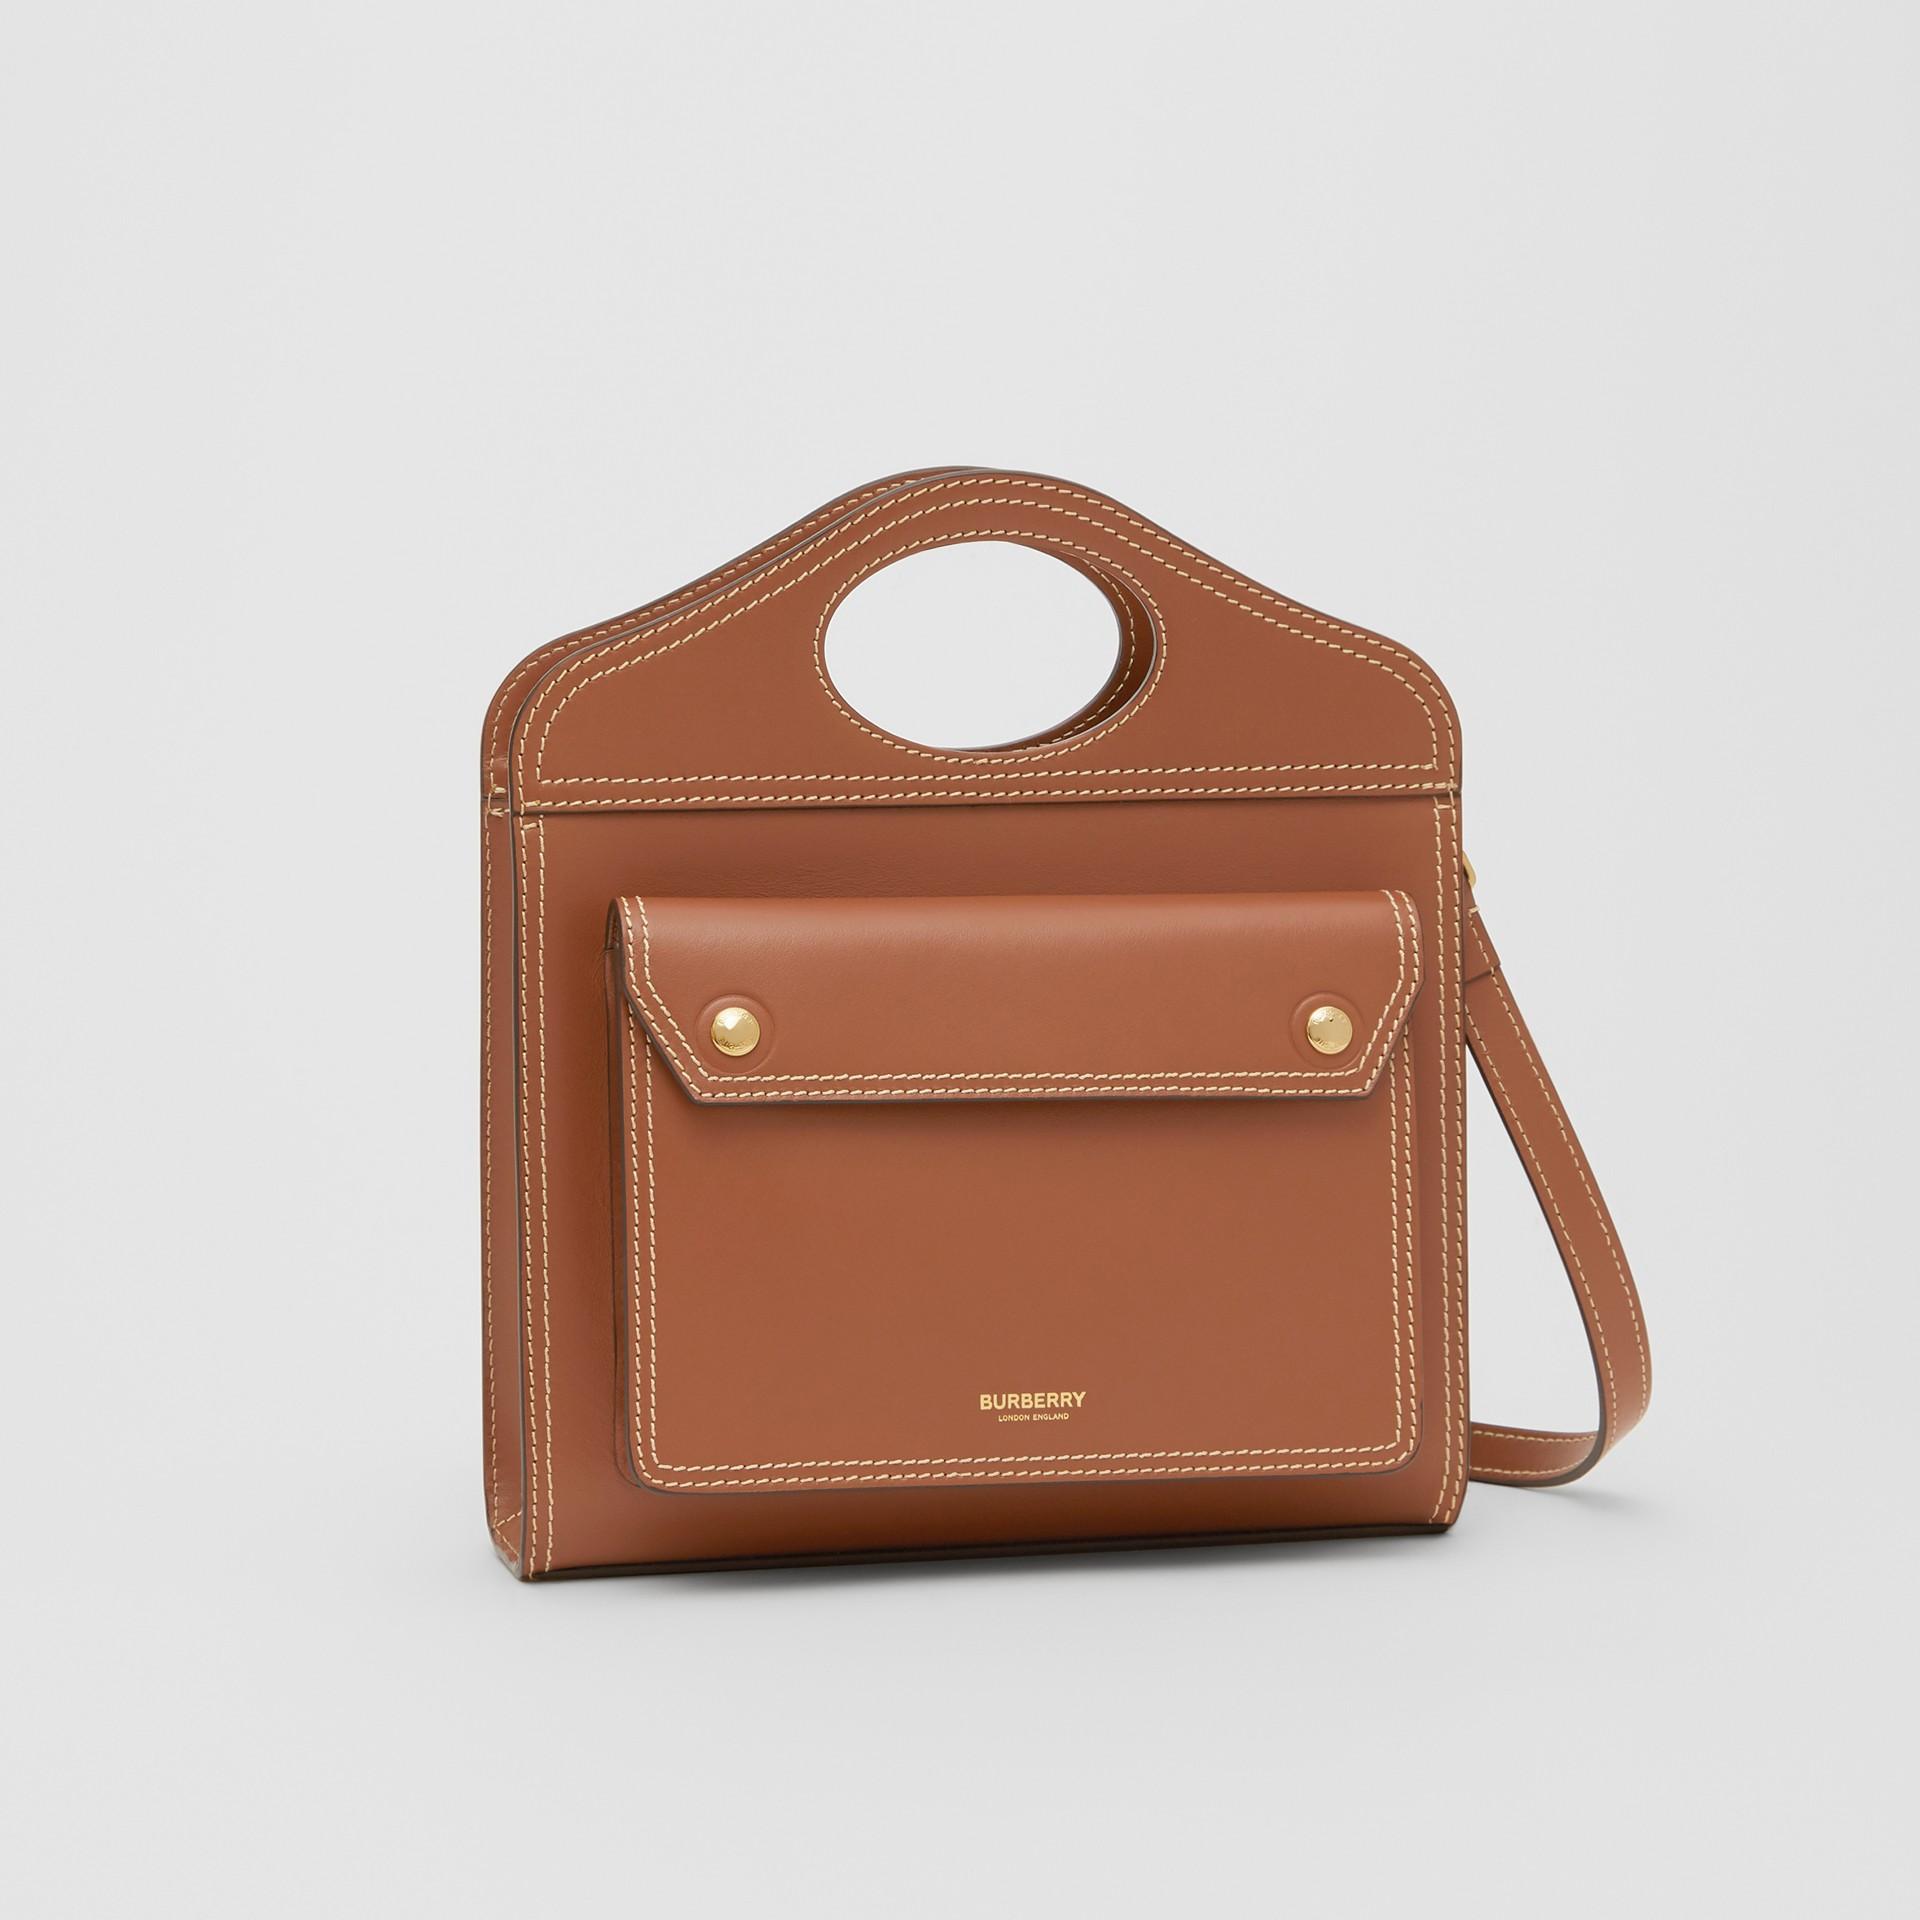 Mini Topstitch Detail Leather Pocket Bag in Malt Brown - Women | Burberry United Kingdom - gallery image 5